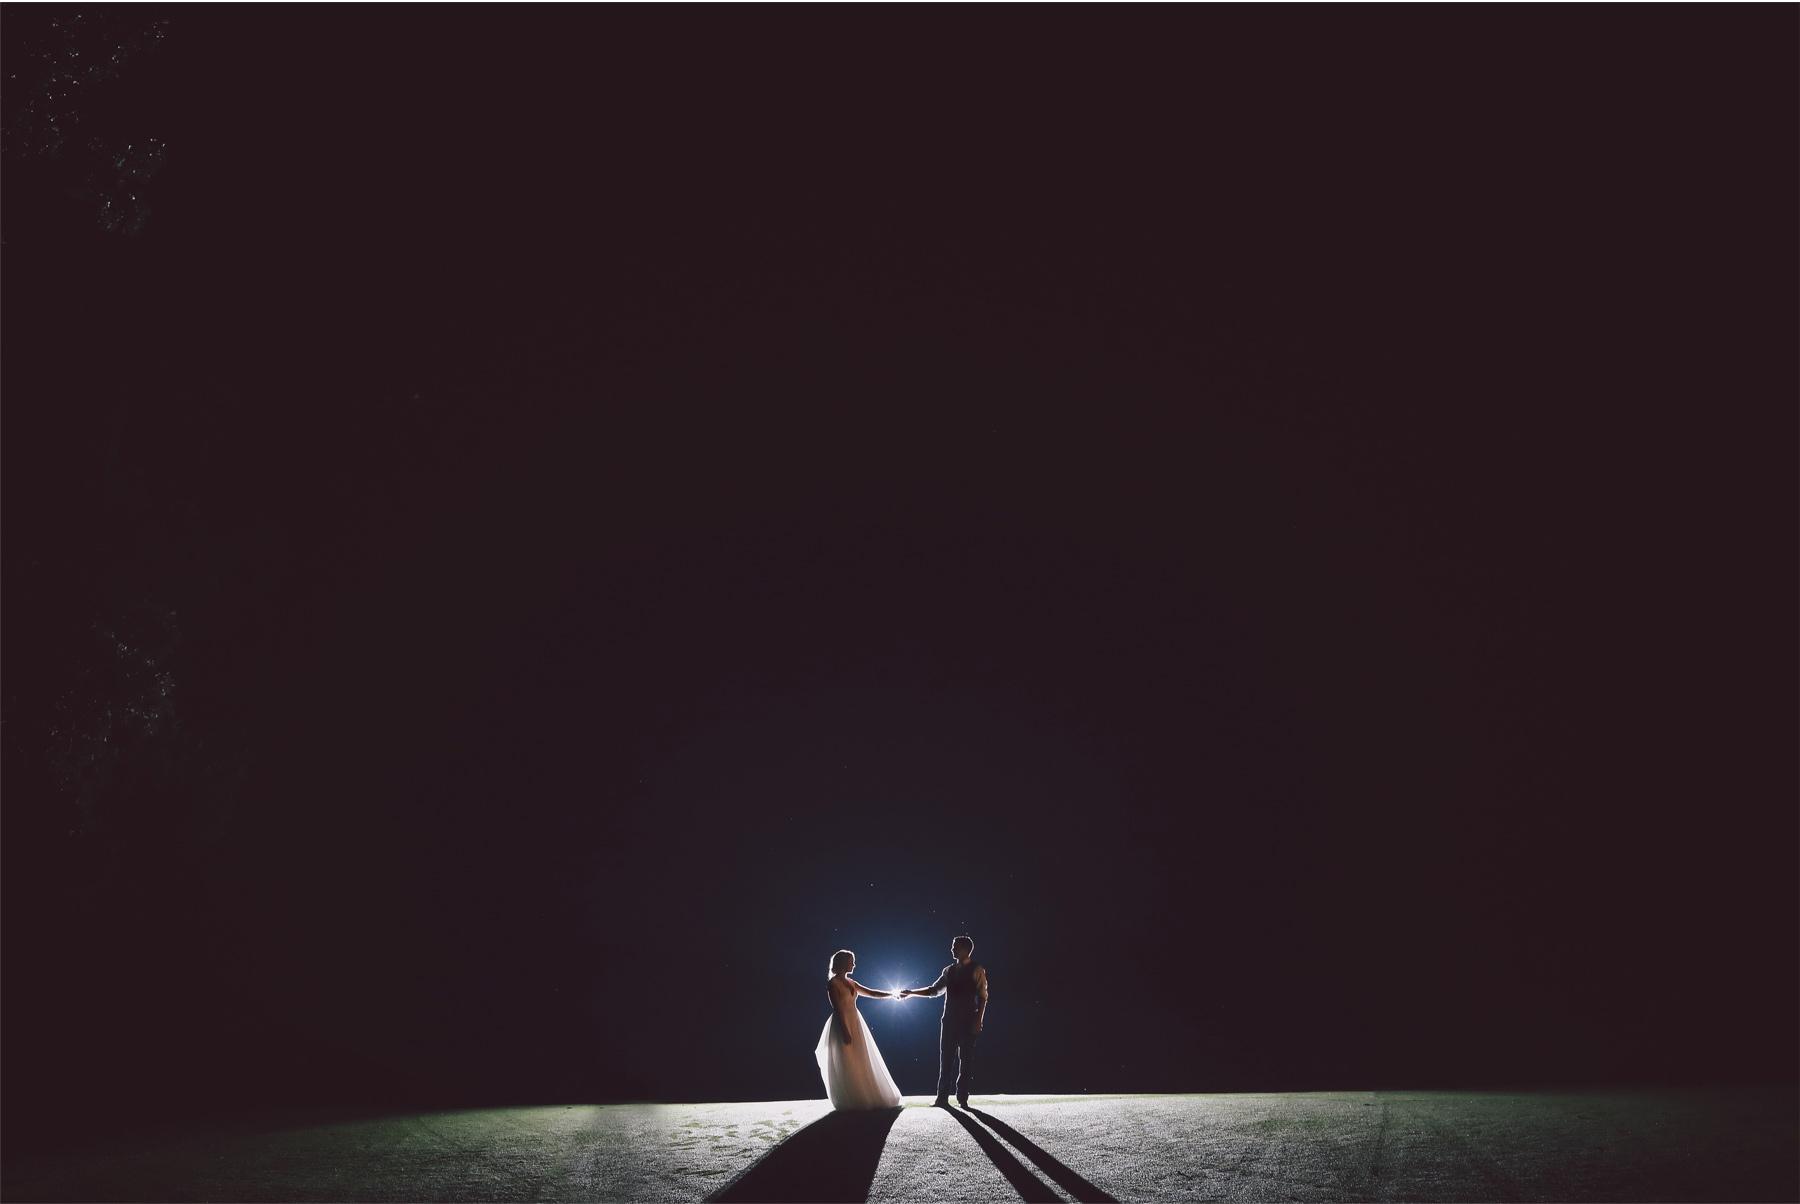 22-Minnetonka-Minnesota-Wedding-Photography-by-Vick-Photography-Lafayette-Club-Night-Photography-Jennifer-and-Adam.jpg